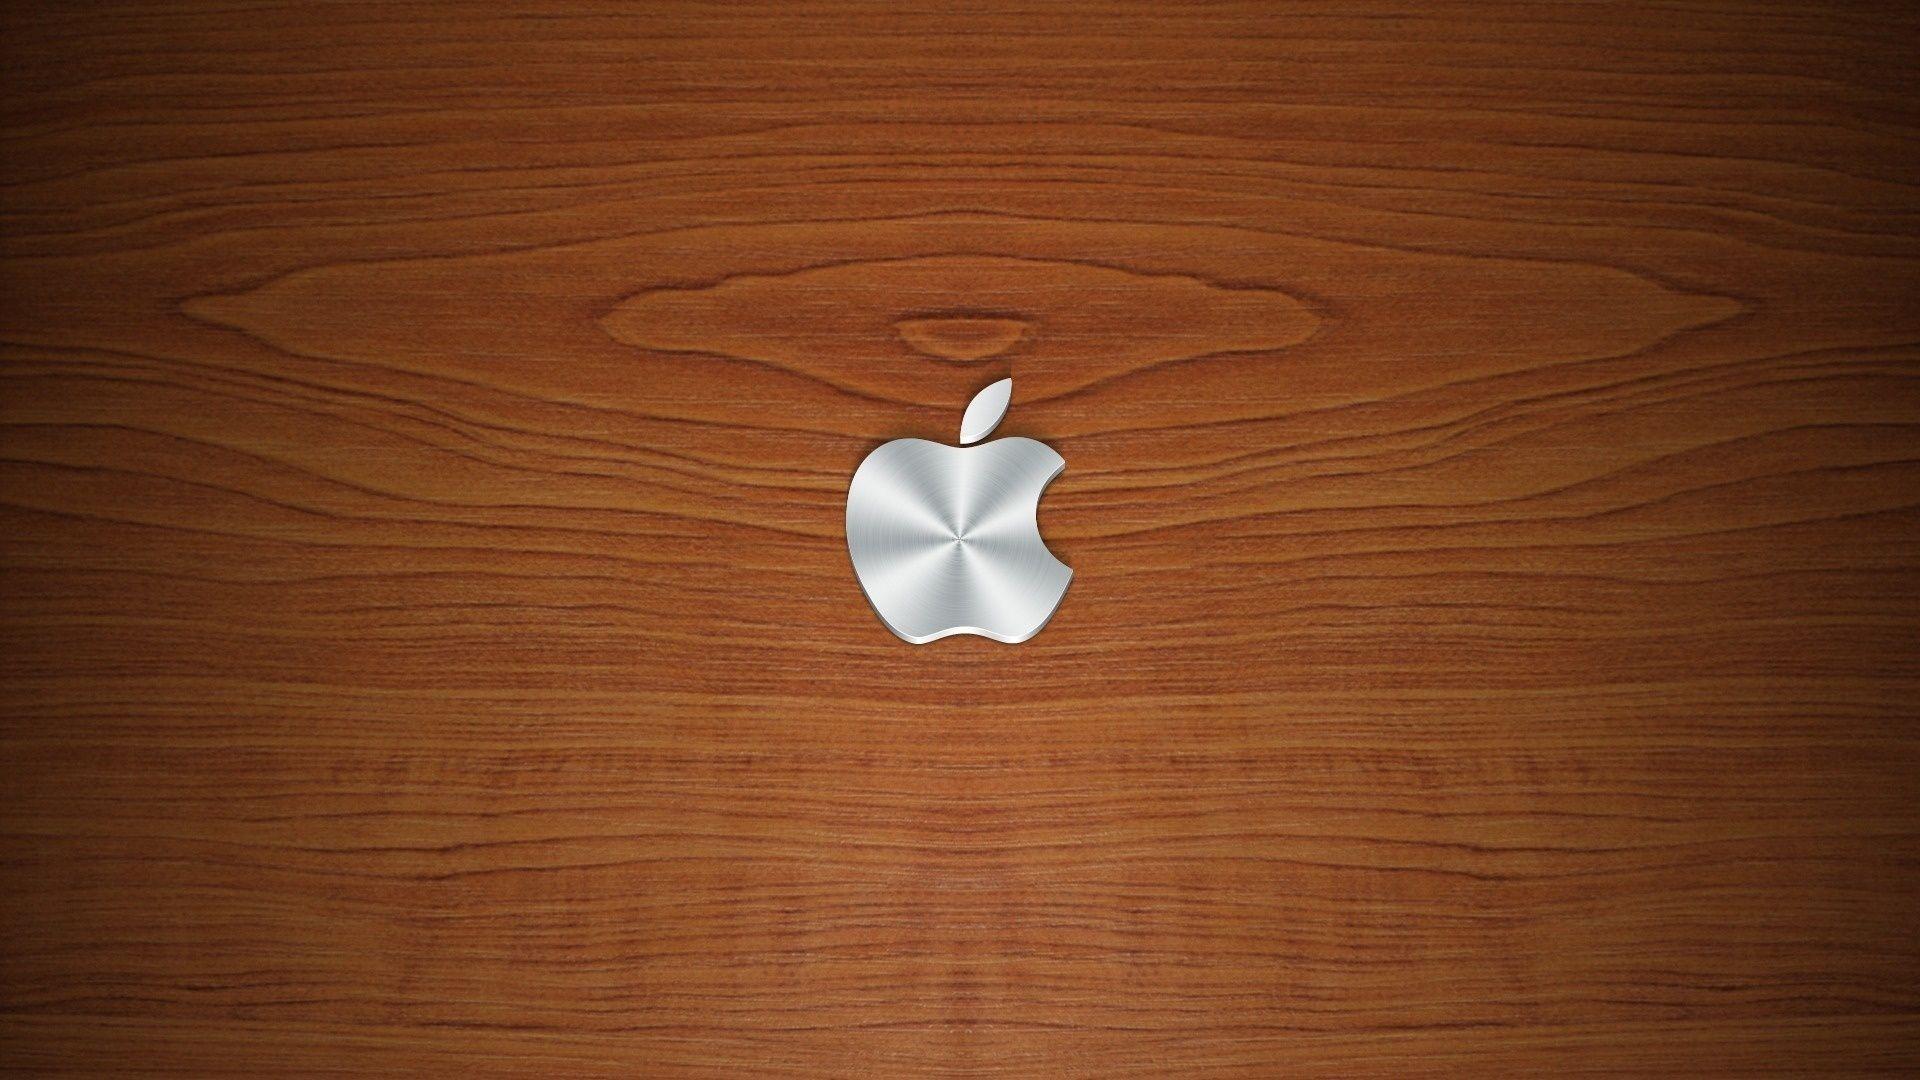 The Apple Logo On Your Desktop